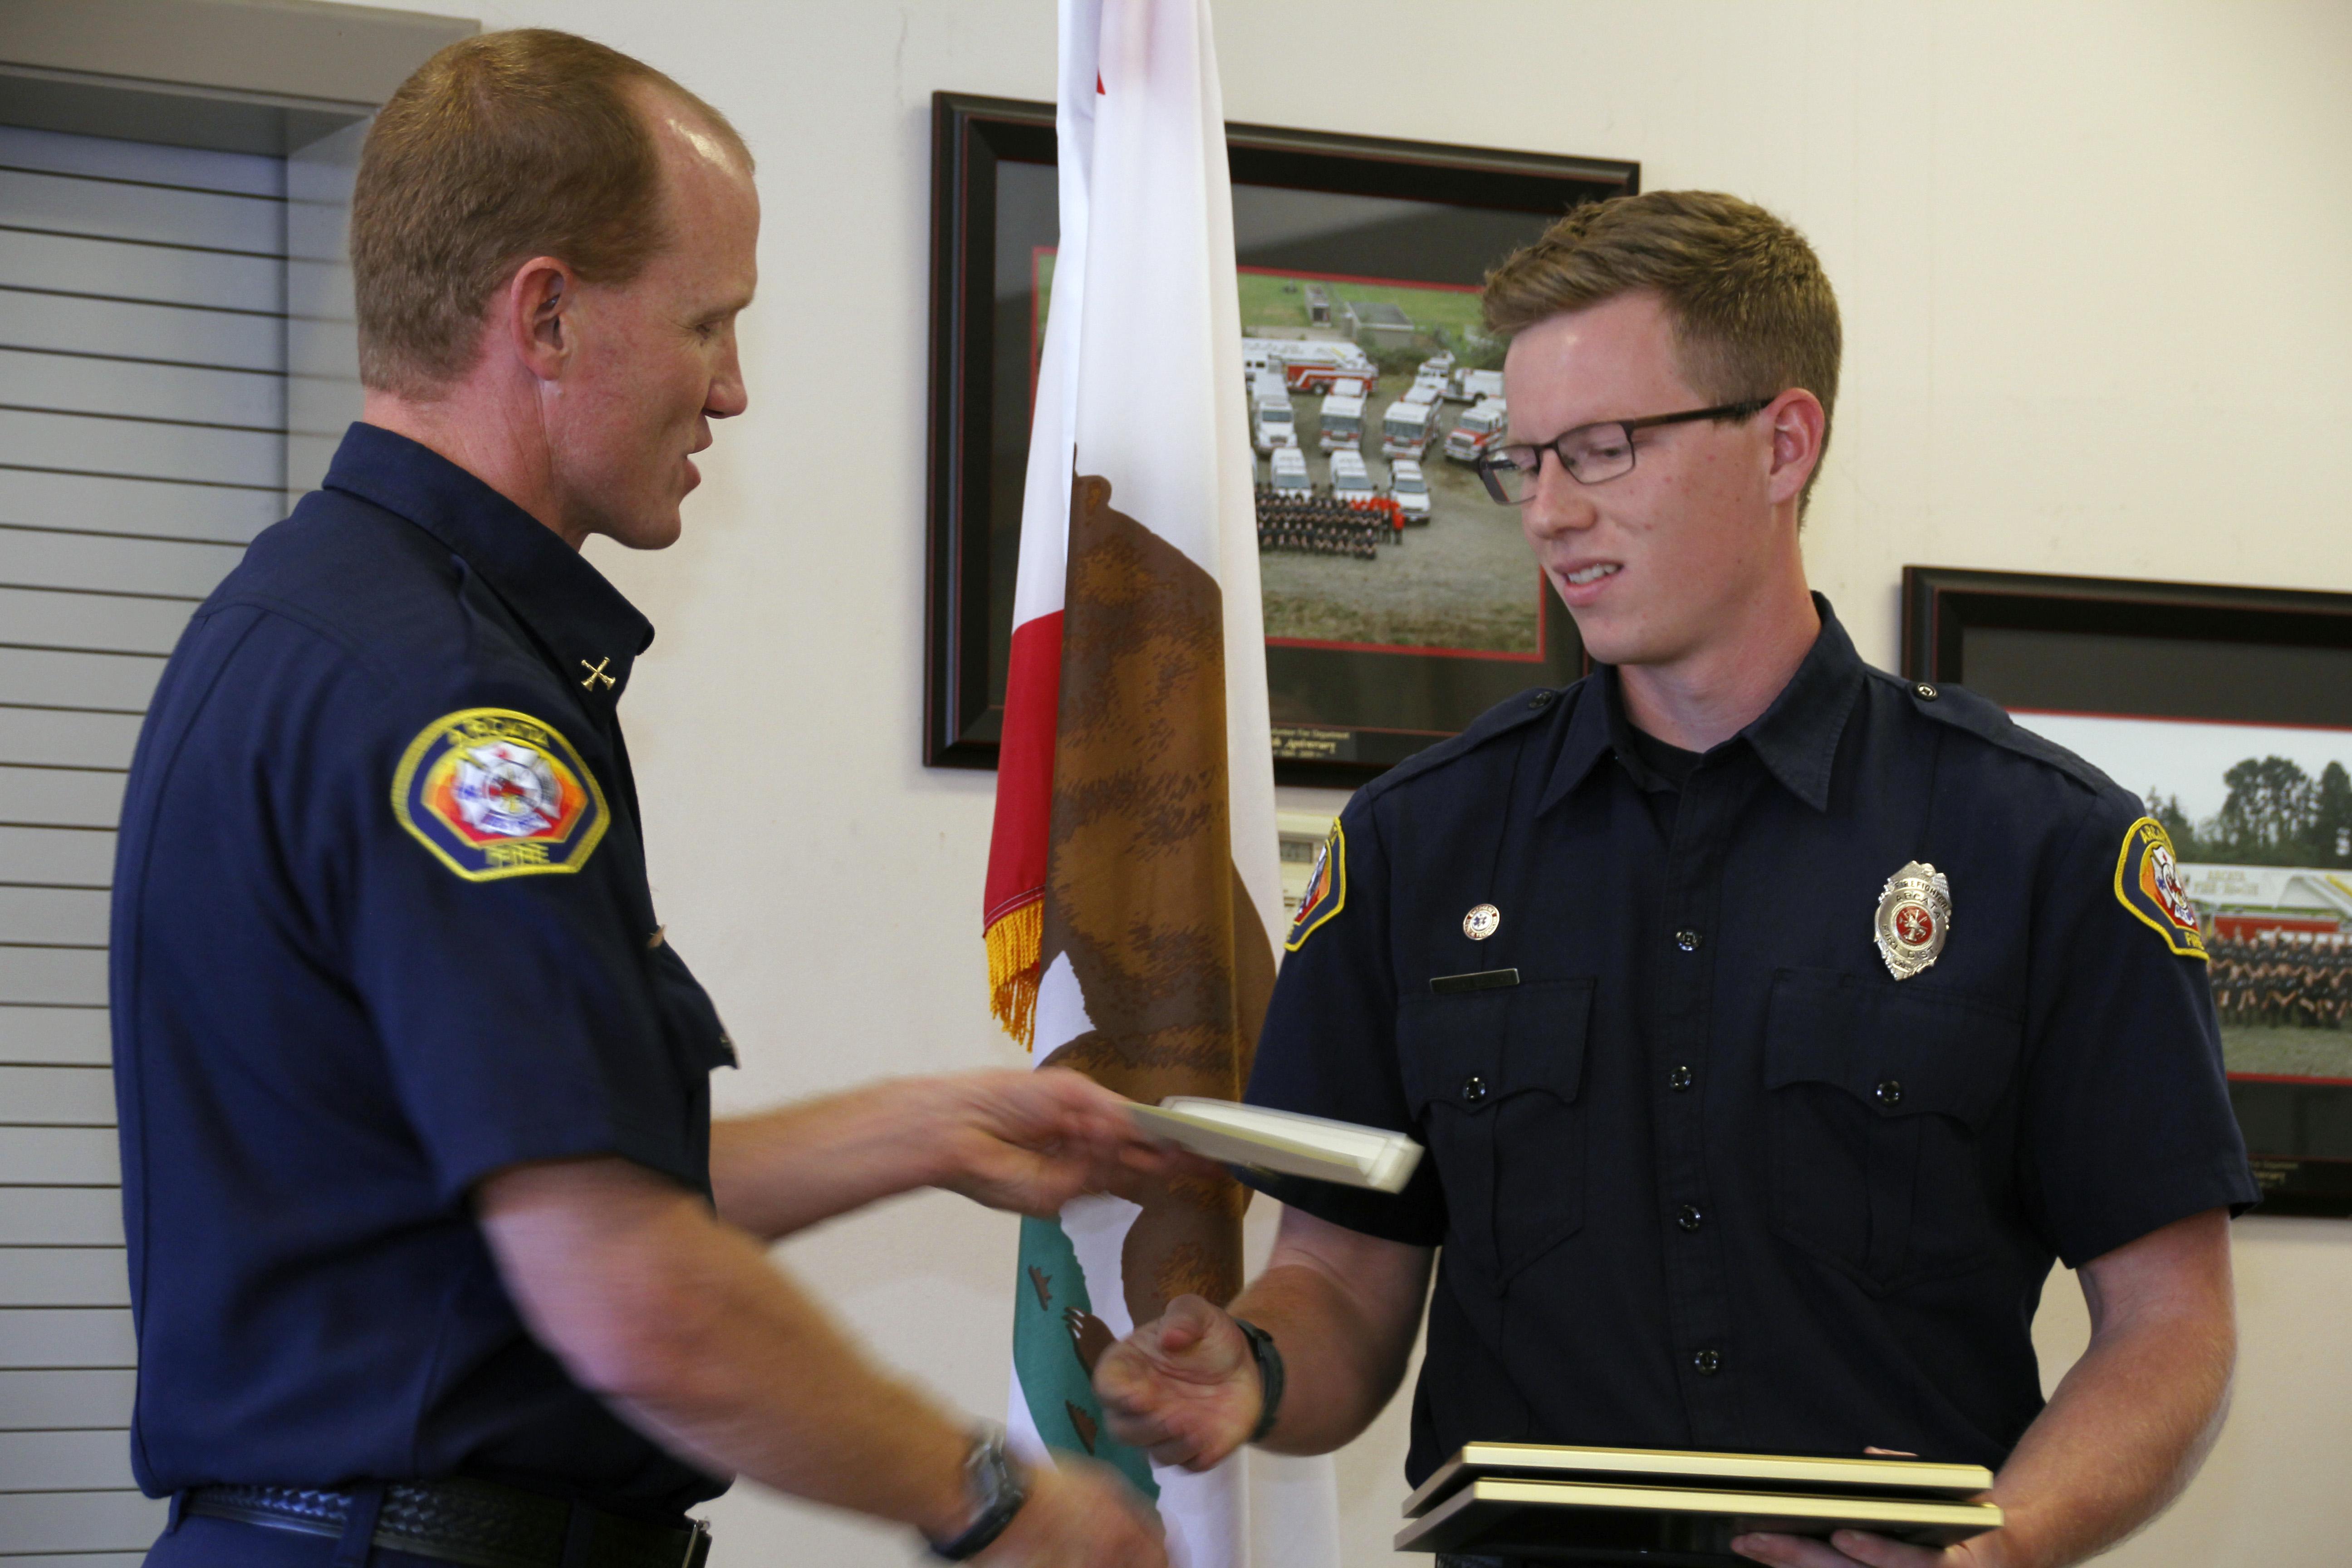 Firefighter Commendation